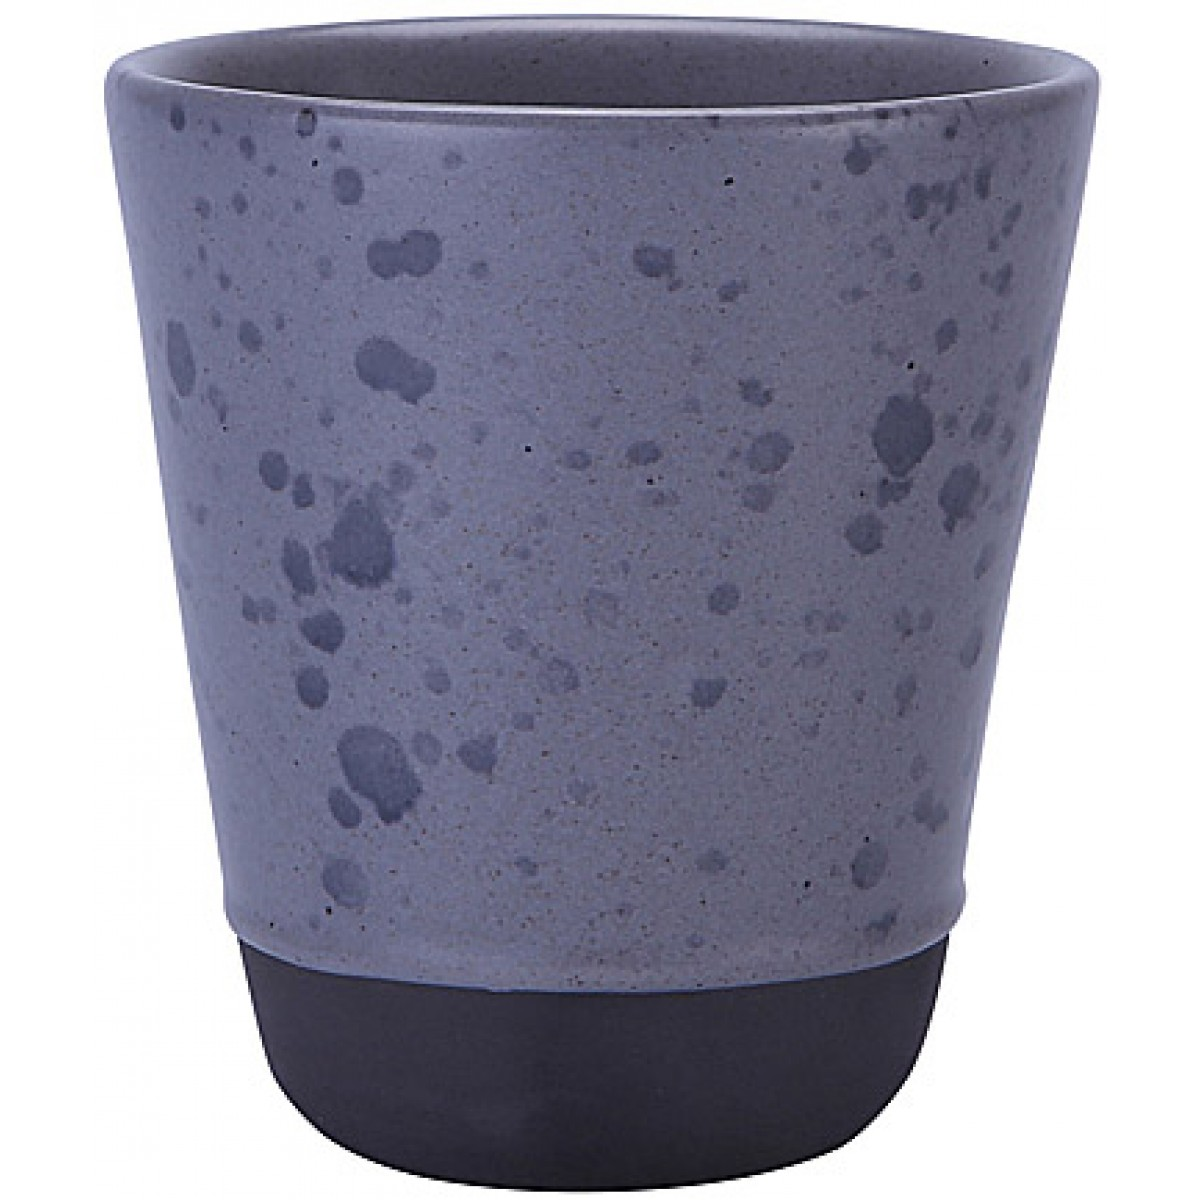 AIDA Raw termo krus grå plettet 30 cl.